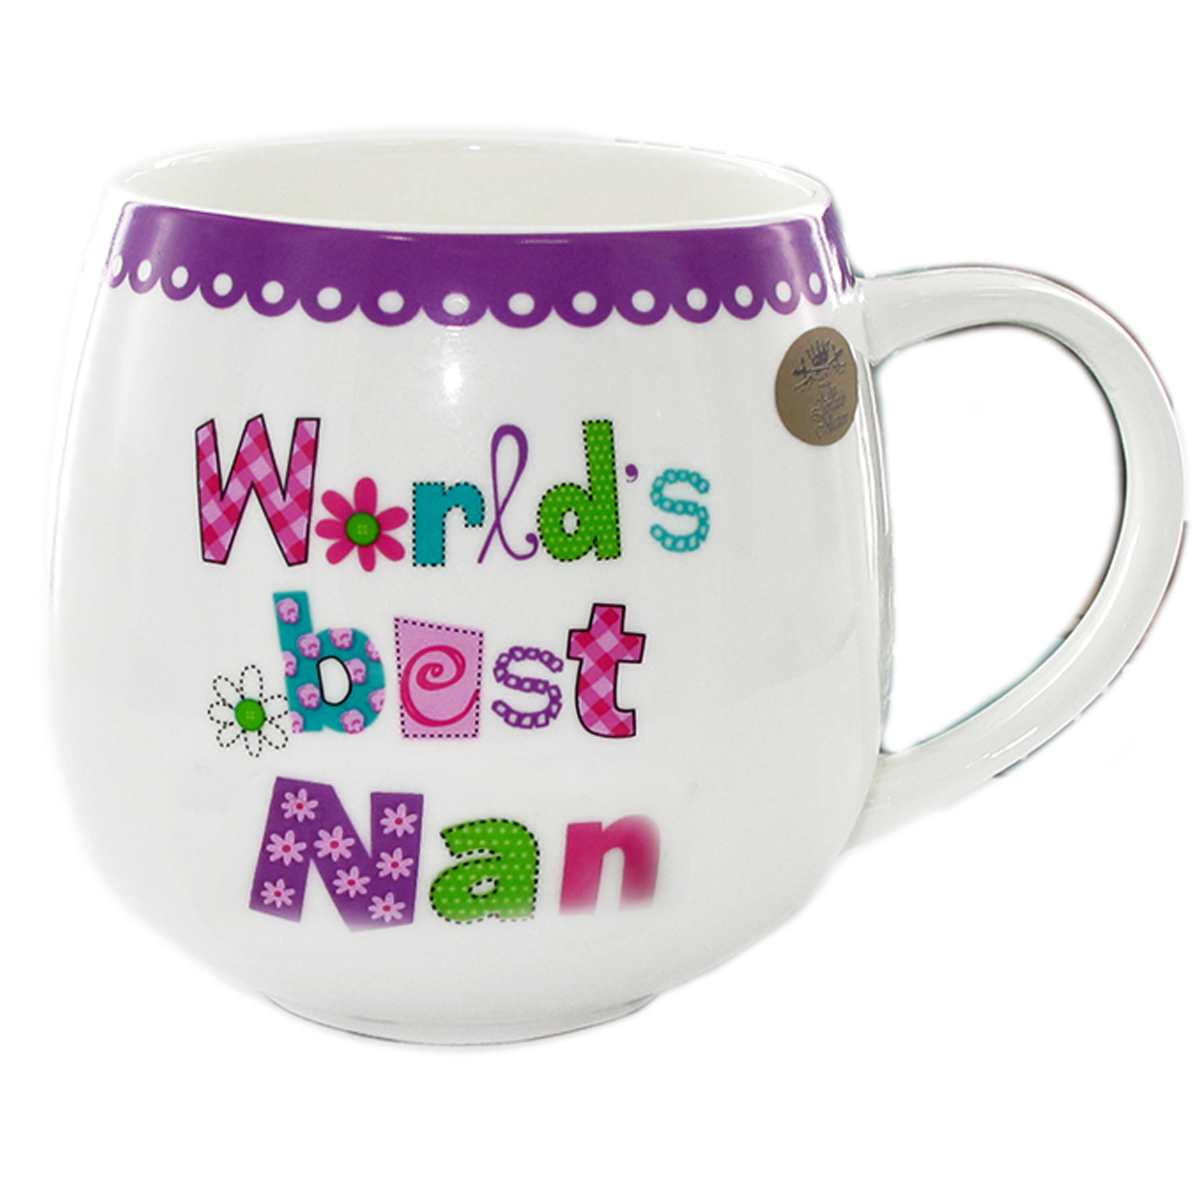 Mug porcelaine \'Messages\' (World\'s best Nan) - 10x75 cm - [Q7220]